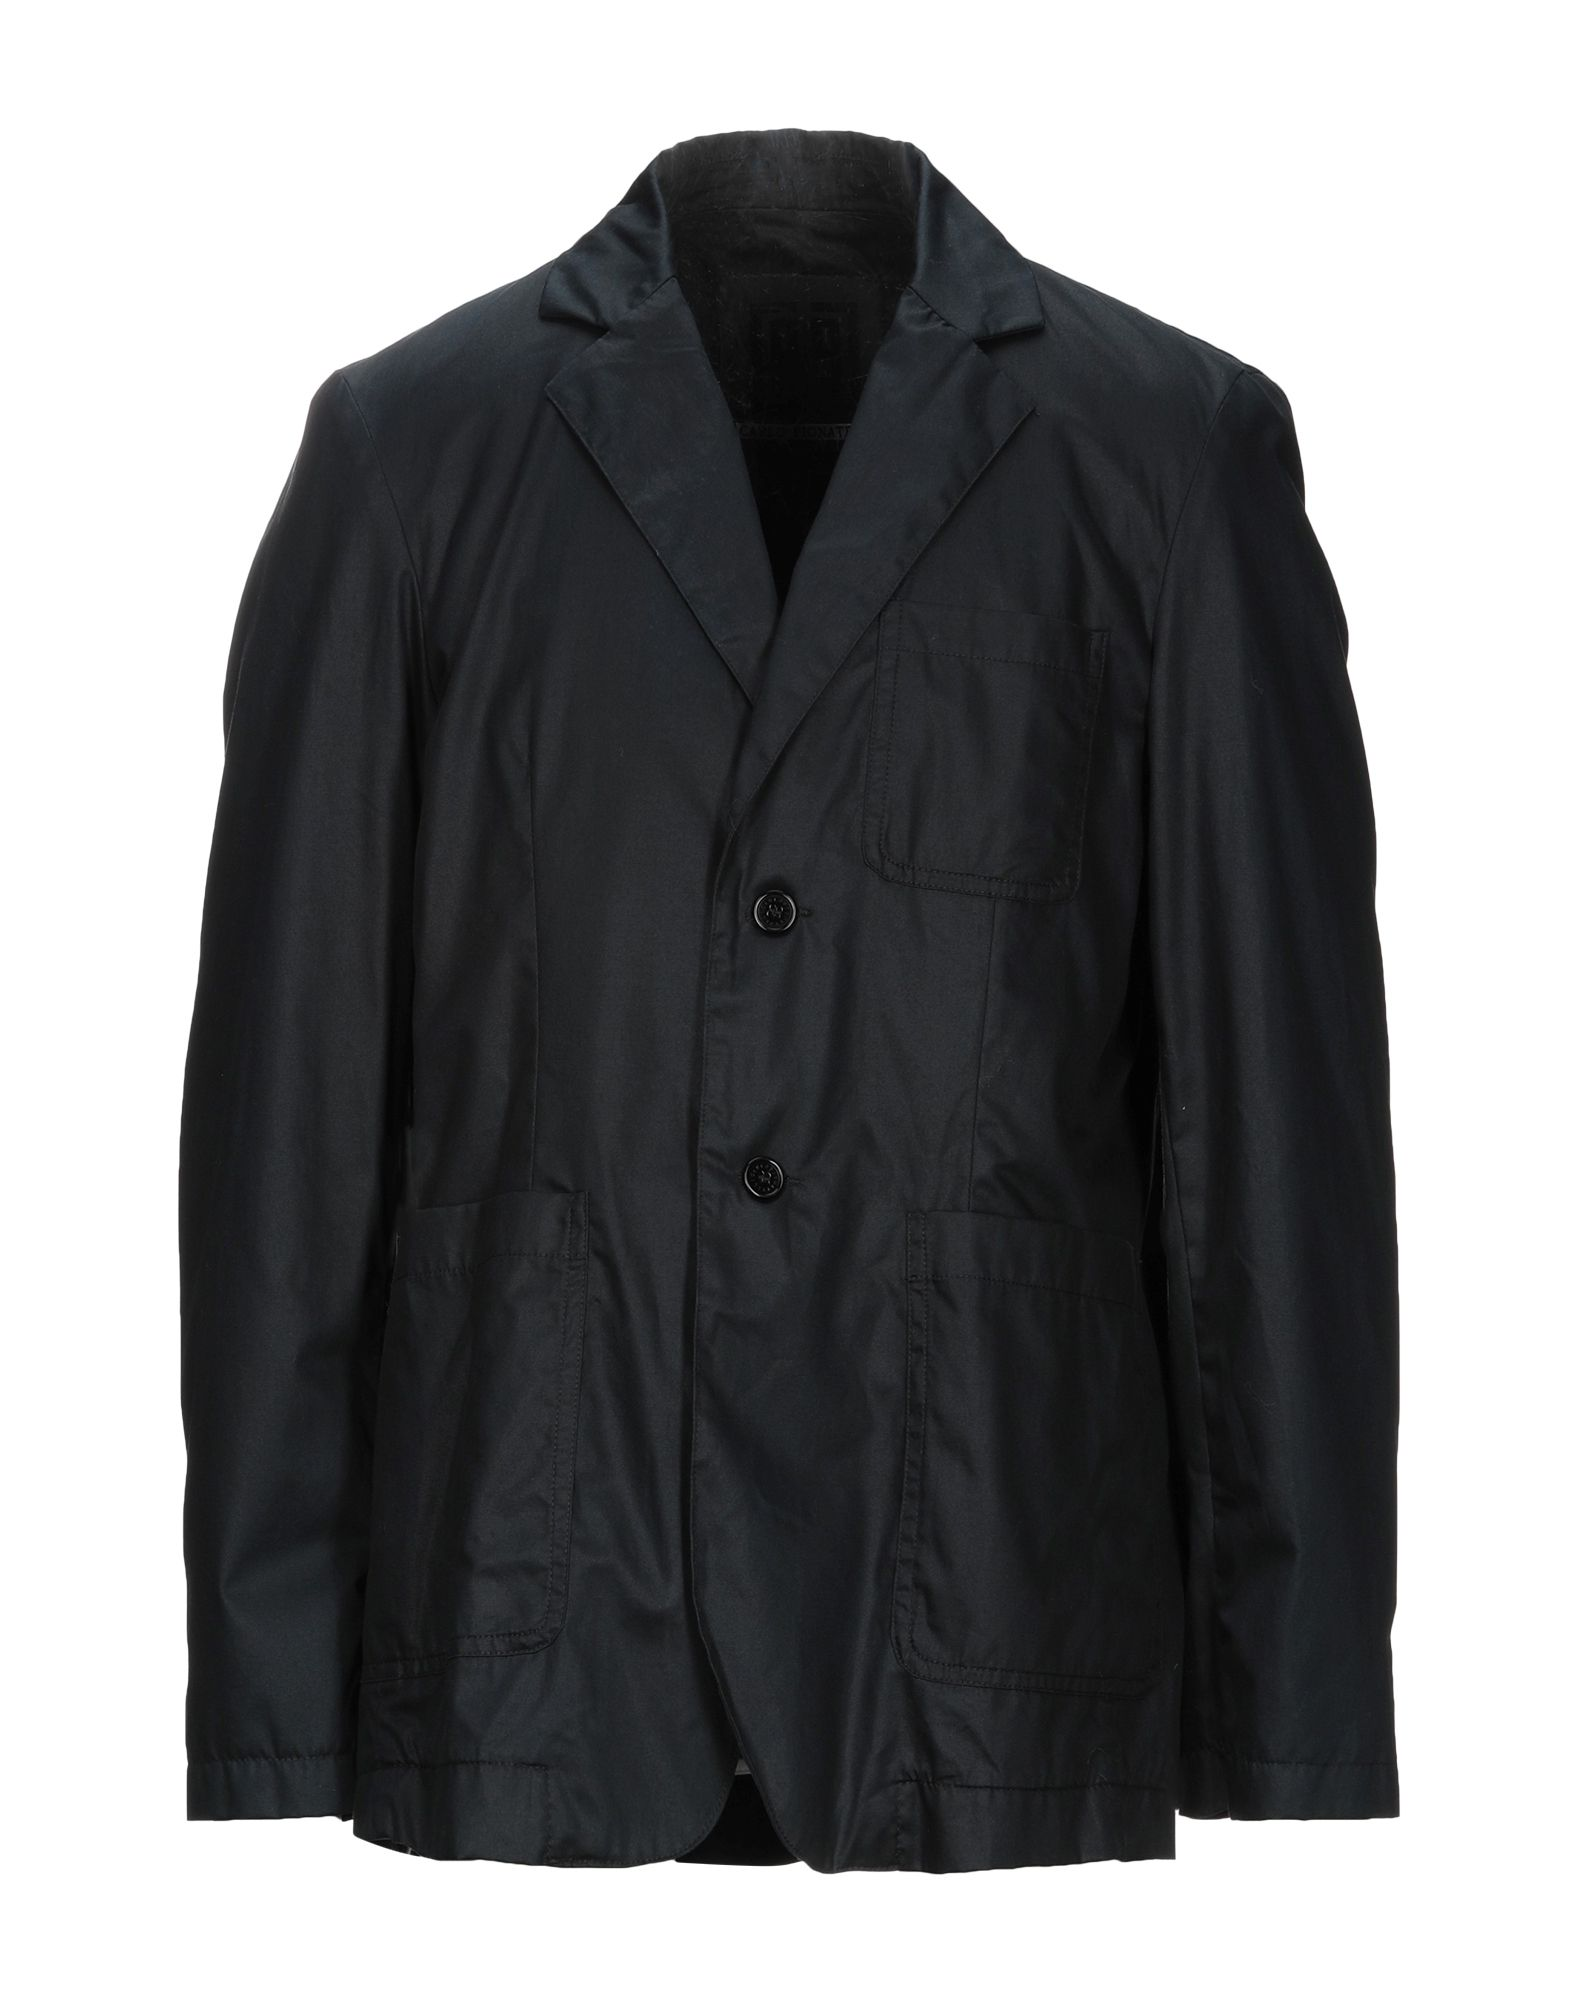 CARLO PIGNATELLI OUTSIDE Куртка carlo pignatelli outside пиджак